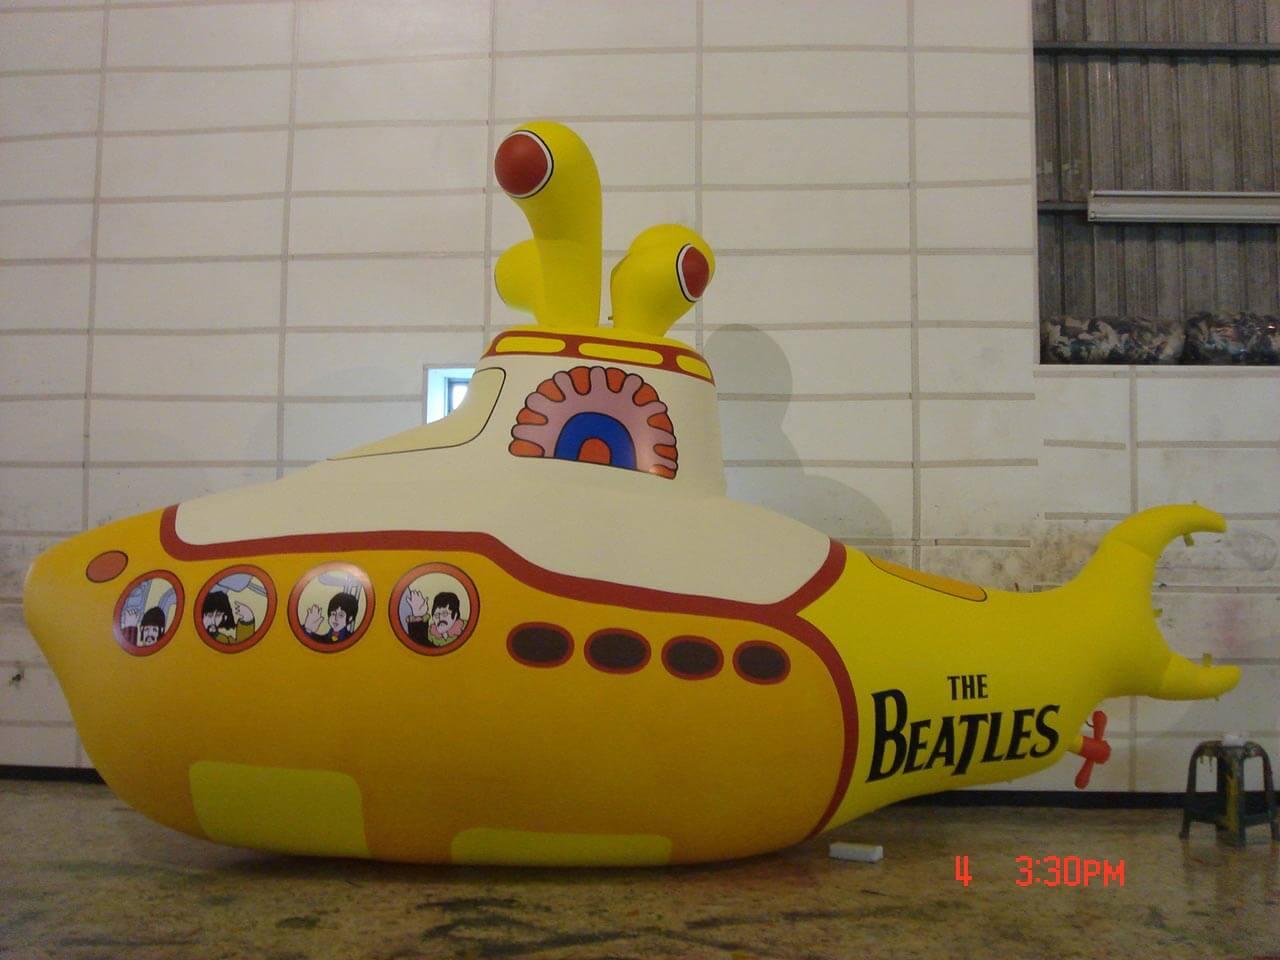 Inflatable custom cartoon submarine balloon黃色卡通版潛水艇造型氣球